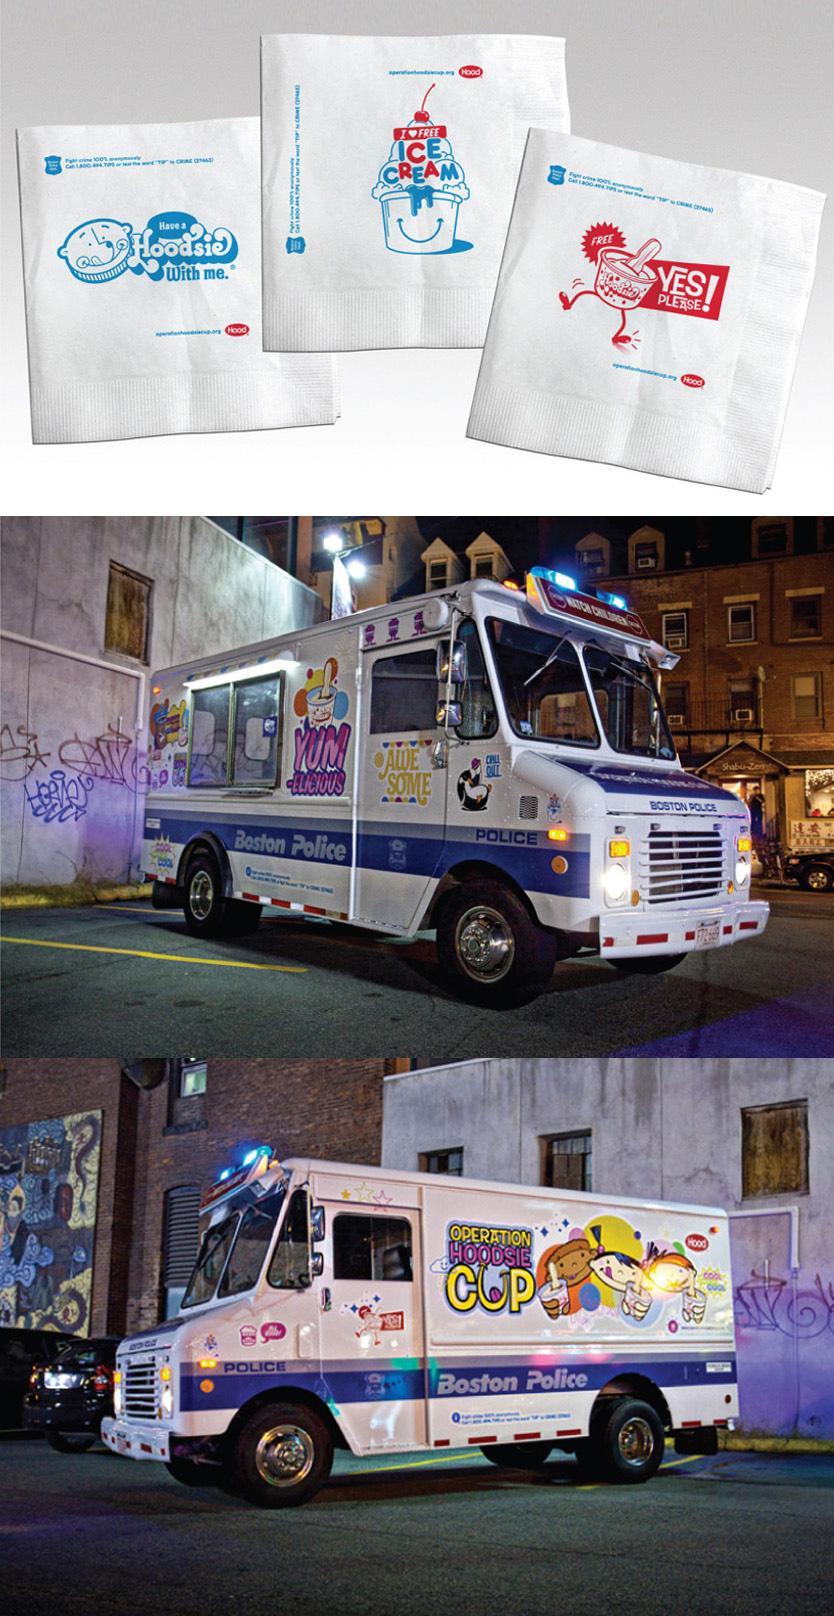 Hoodsie Ice Cream Ambient Ad -  Ice Cream Truck Patrol Car